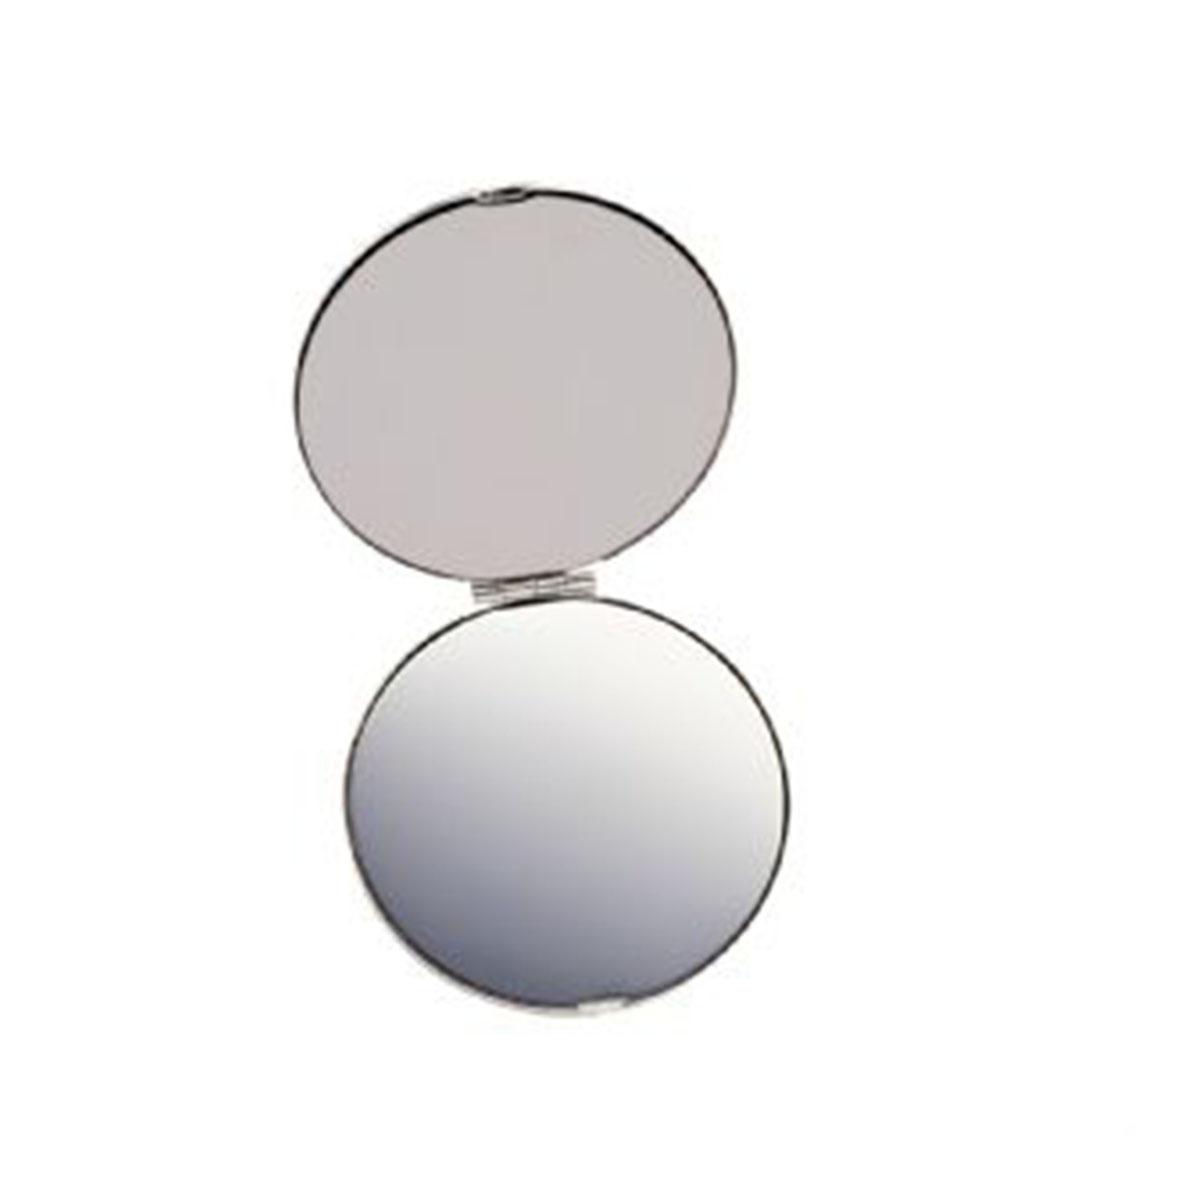 Silver Compact Mirror-Silver.